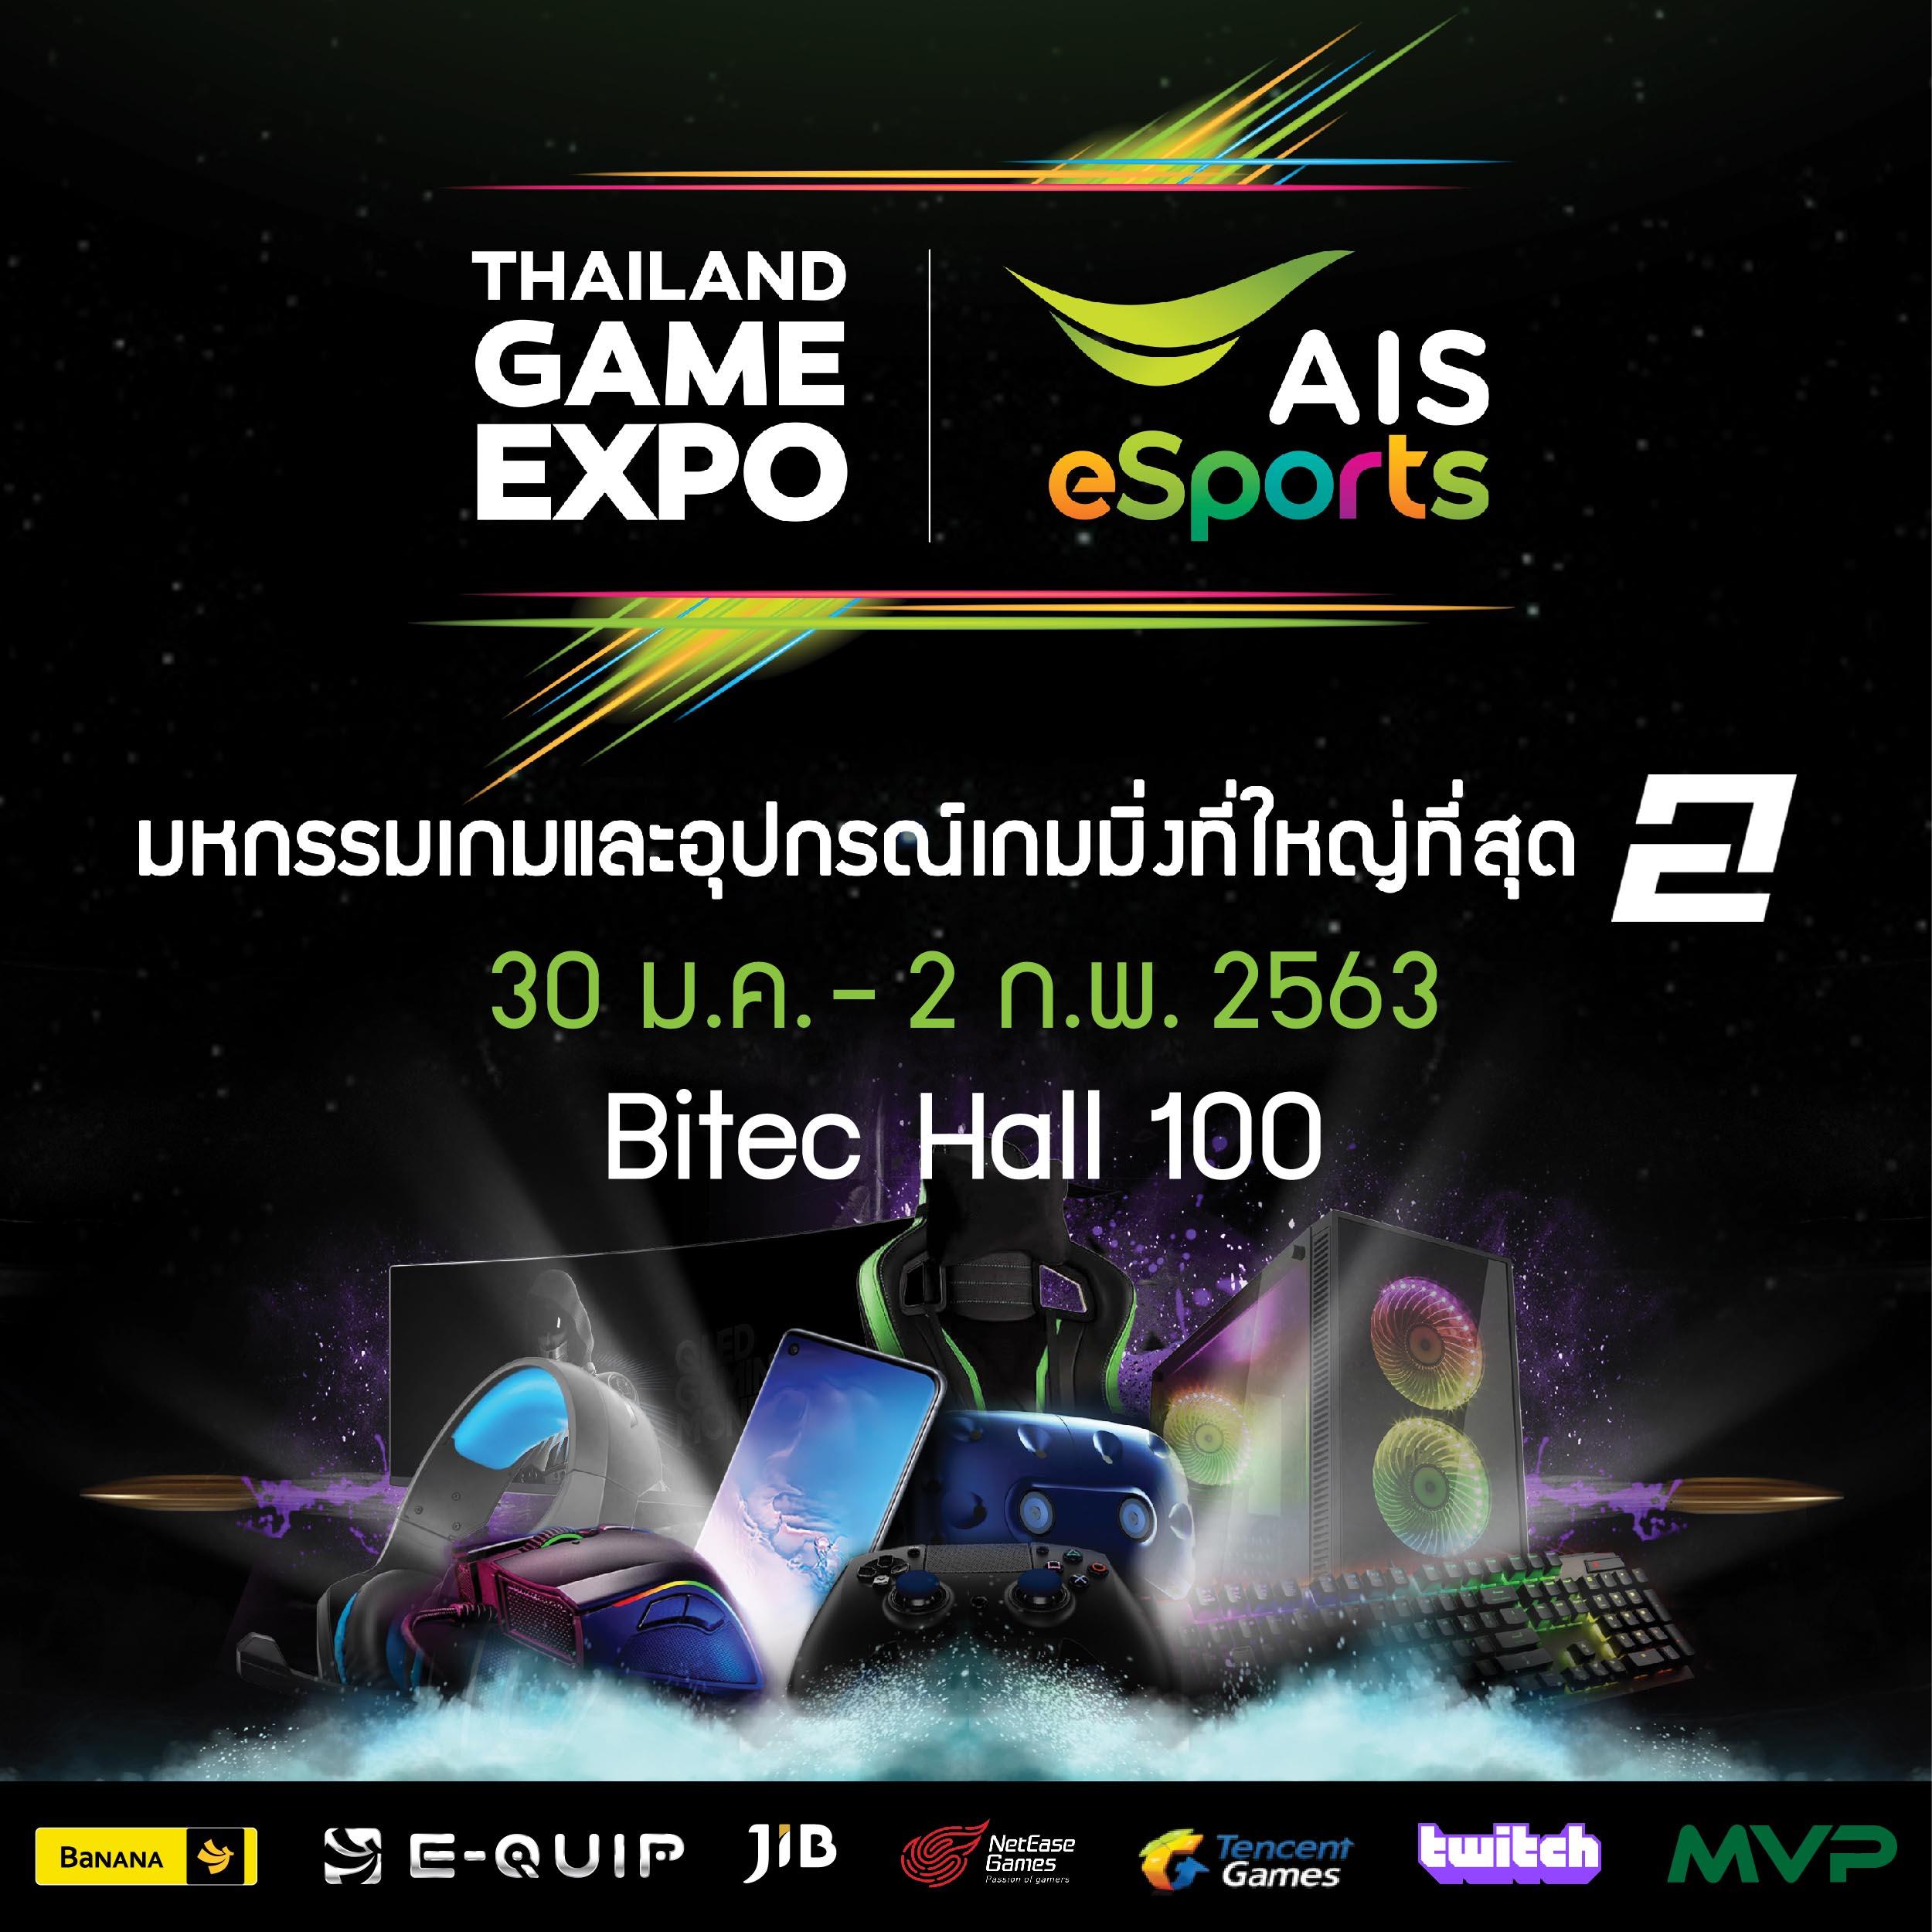 Thailand Game Expo by AIS eSports 1412020 2